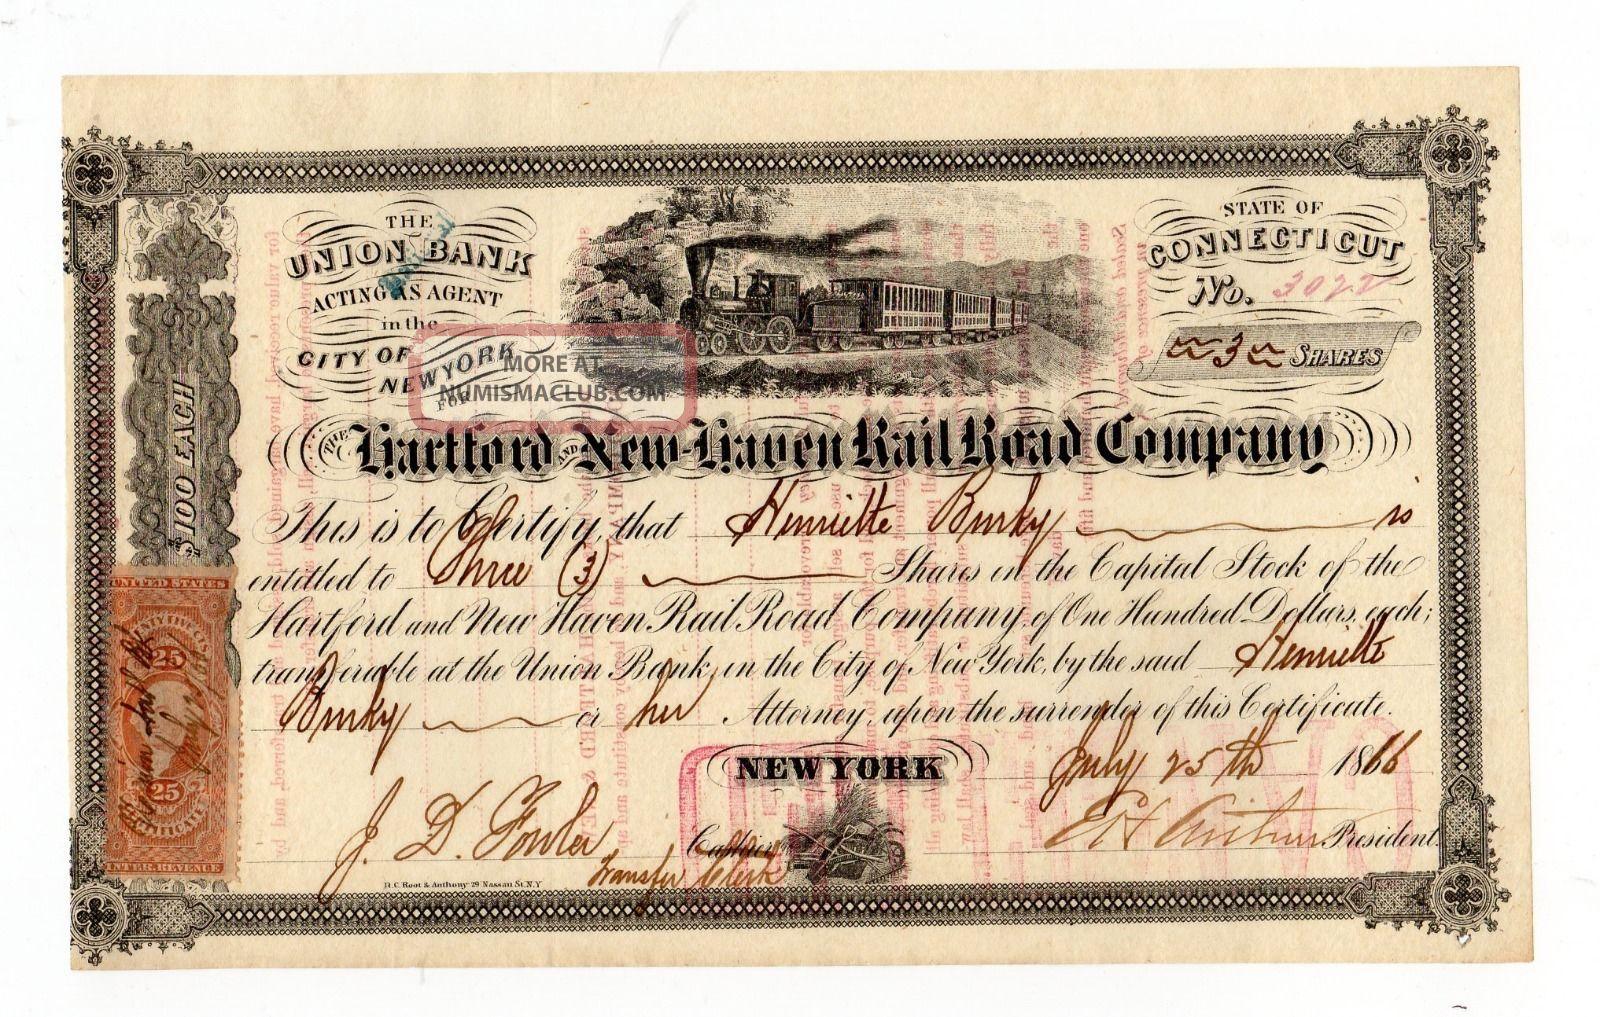 1866 Hartford And Haven Railroad Company Stock Certificate Transportation photo